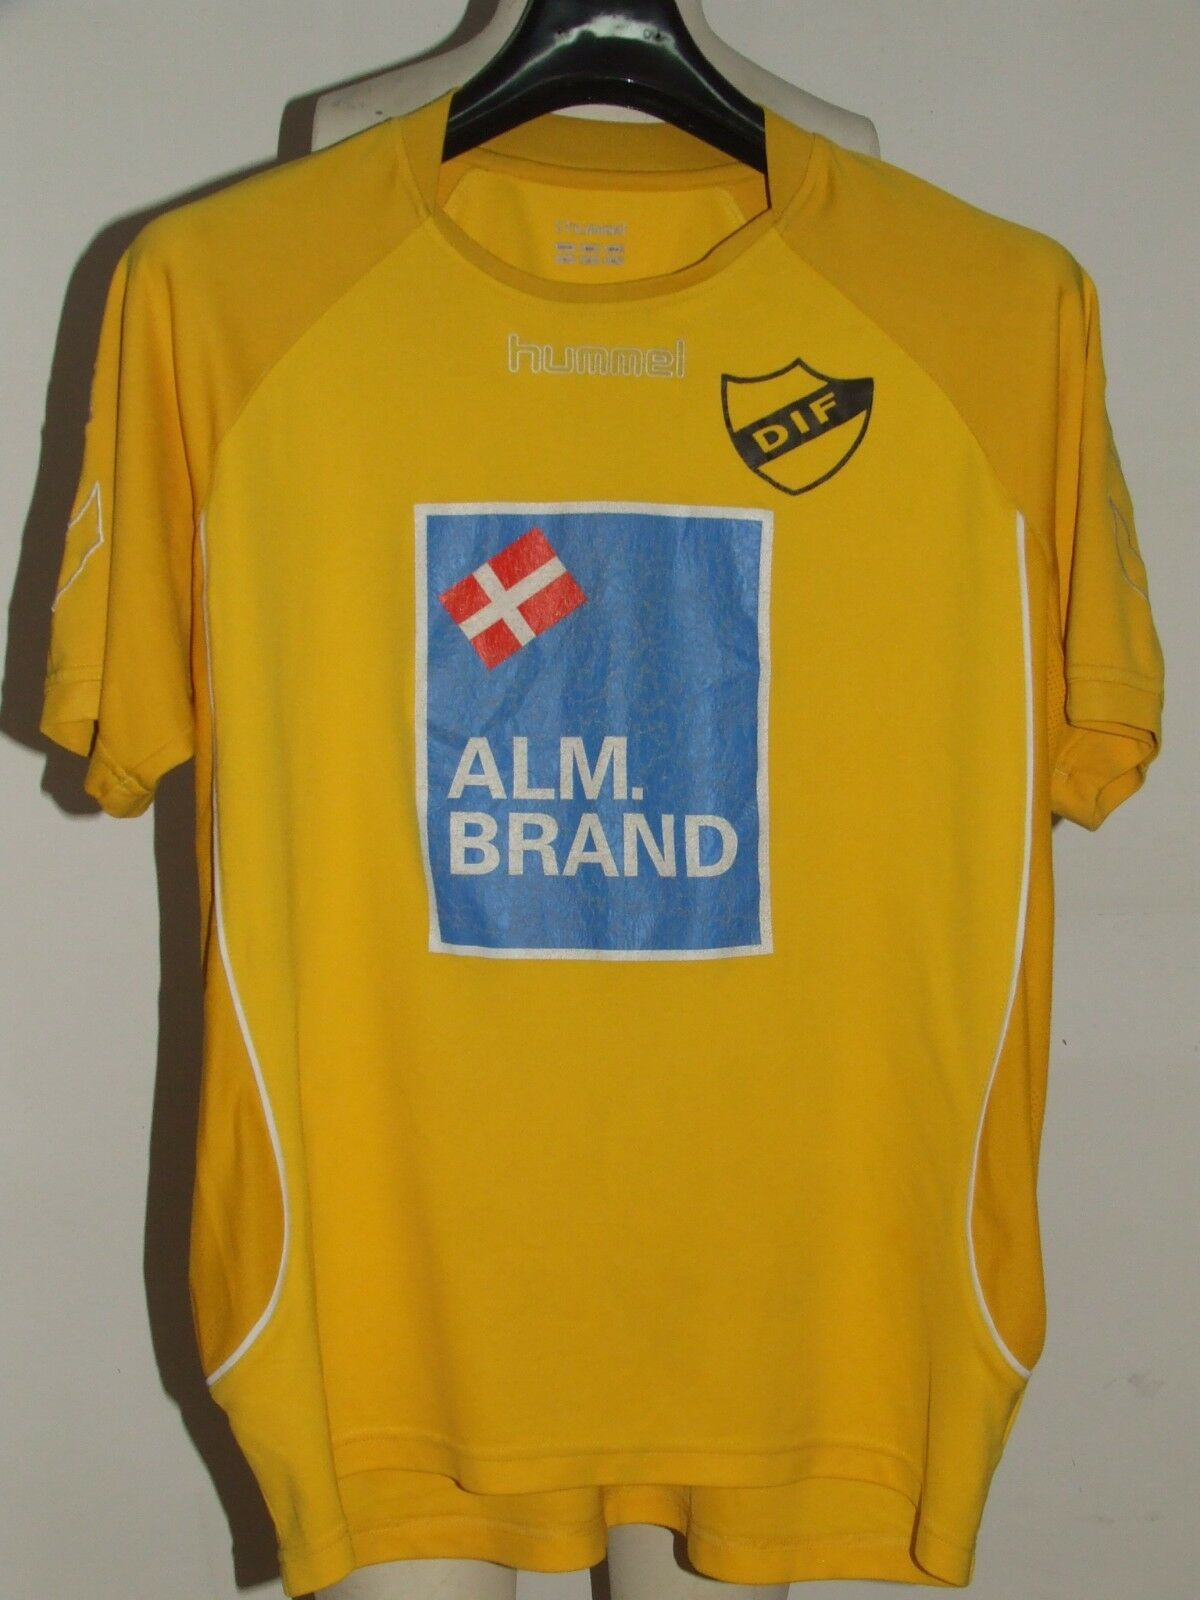 Fußballtrikot Trikot Maillot Maillot Maillot Camiseta Sport matchworn djurgardens Nr10 a39568